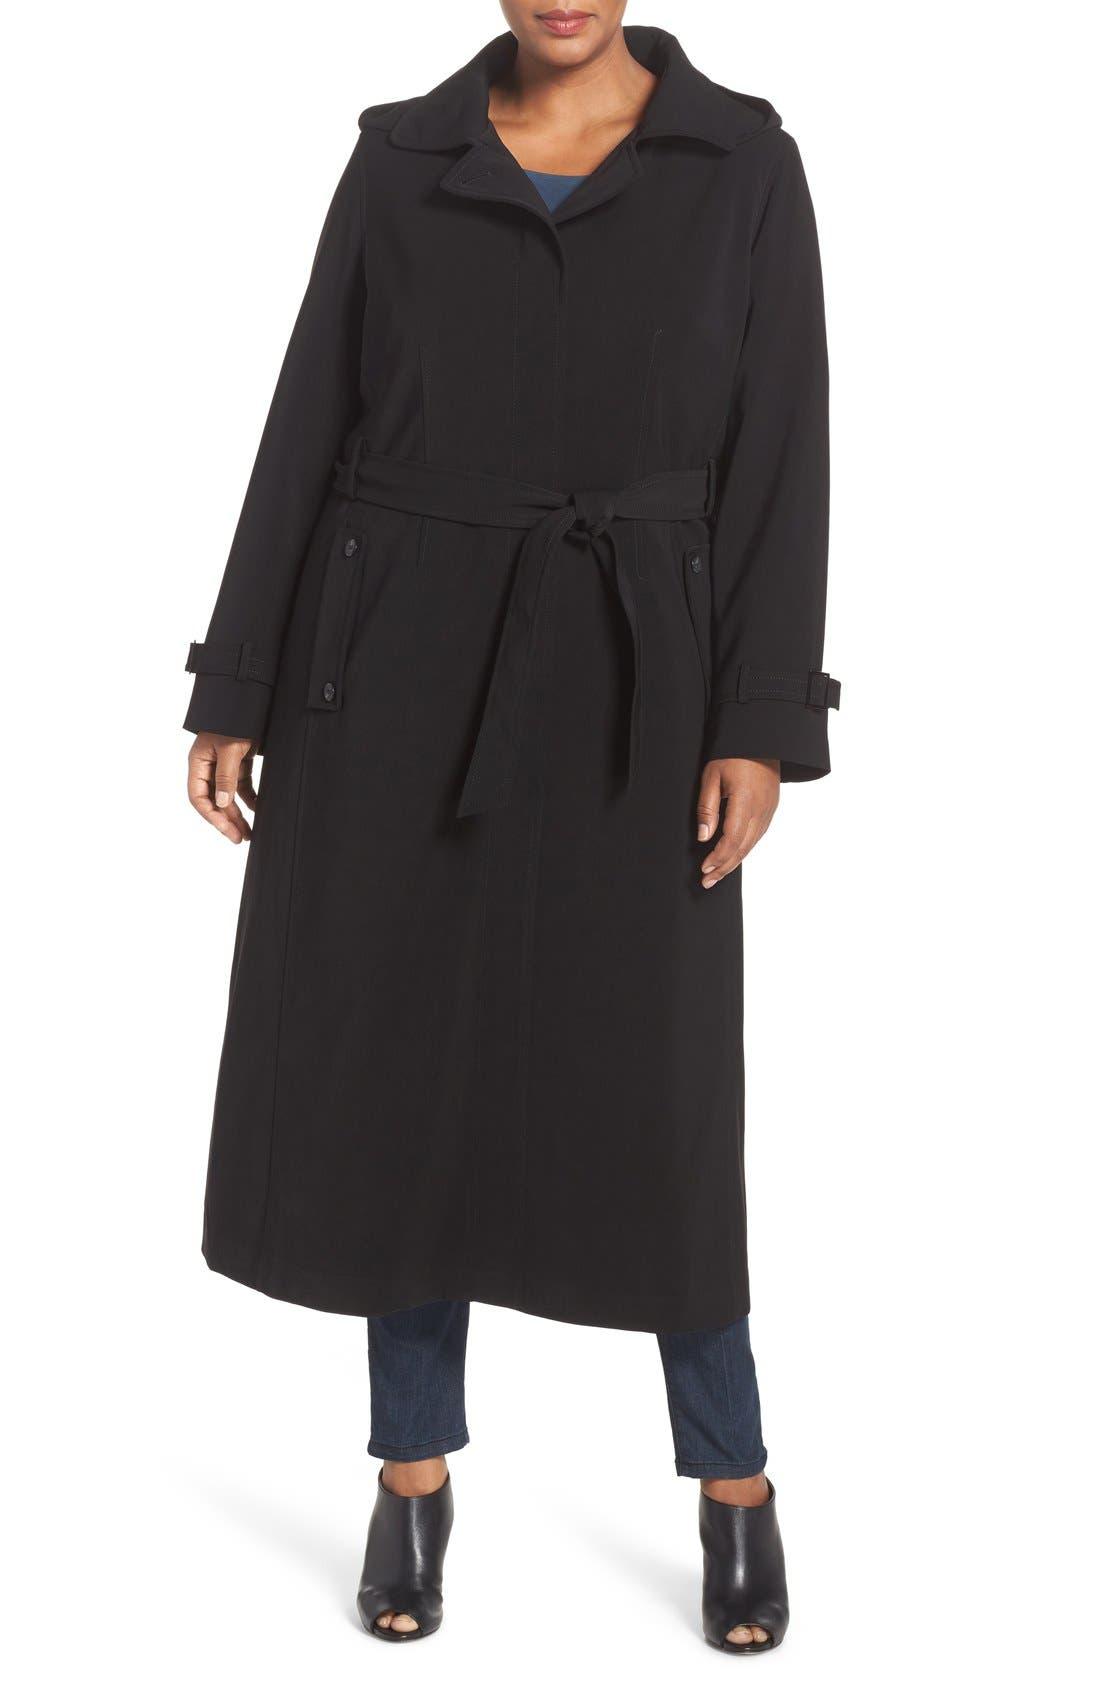 Long Nepage Raincoat with Detachable Hood & Liner,                         Main,                         color, Black